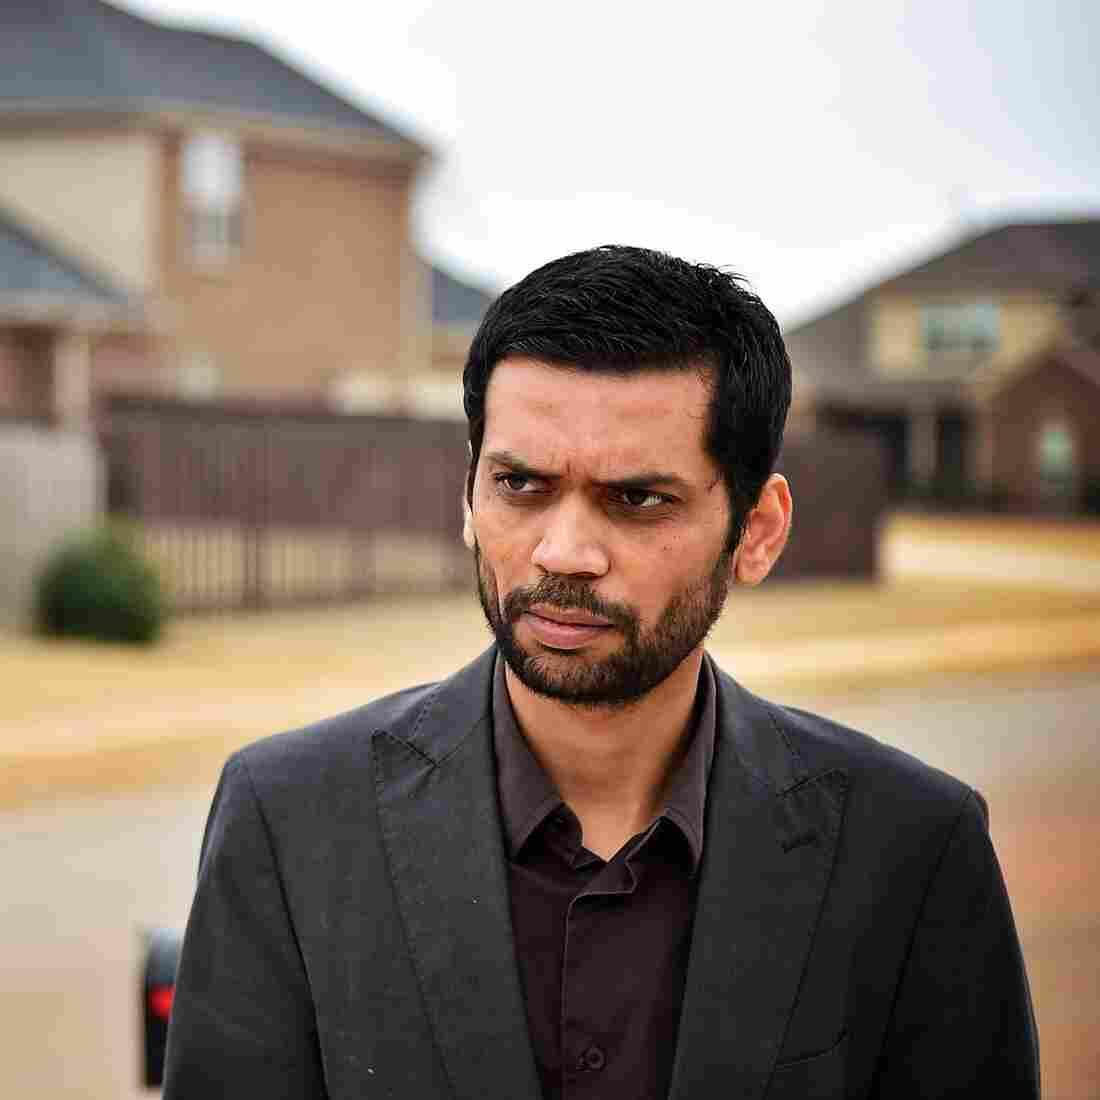 Alabama Police Officer Arrested Over Severe Injuries To Indian Man